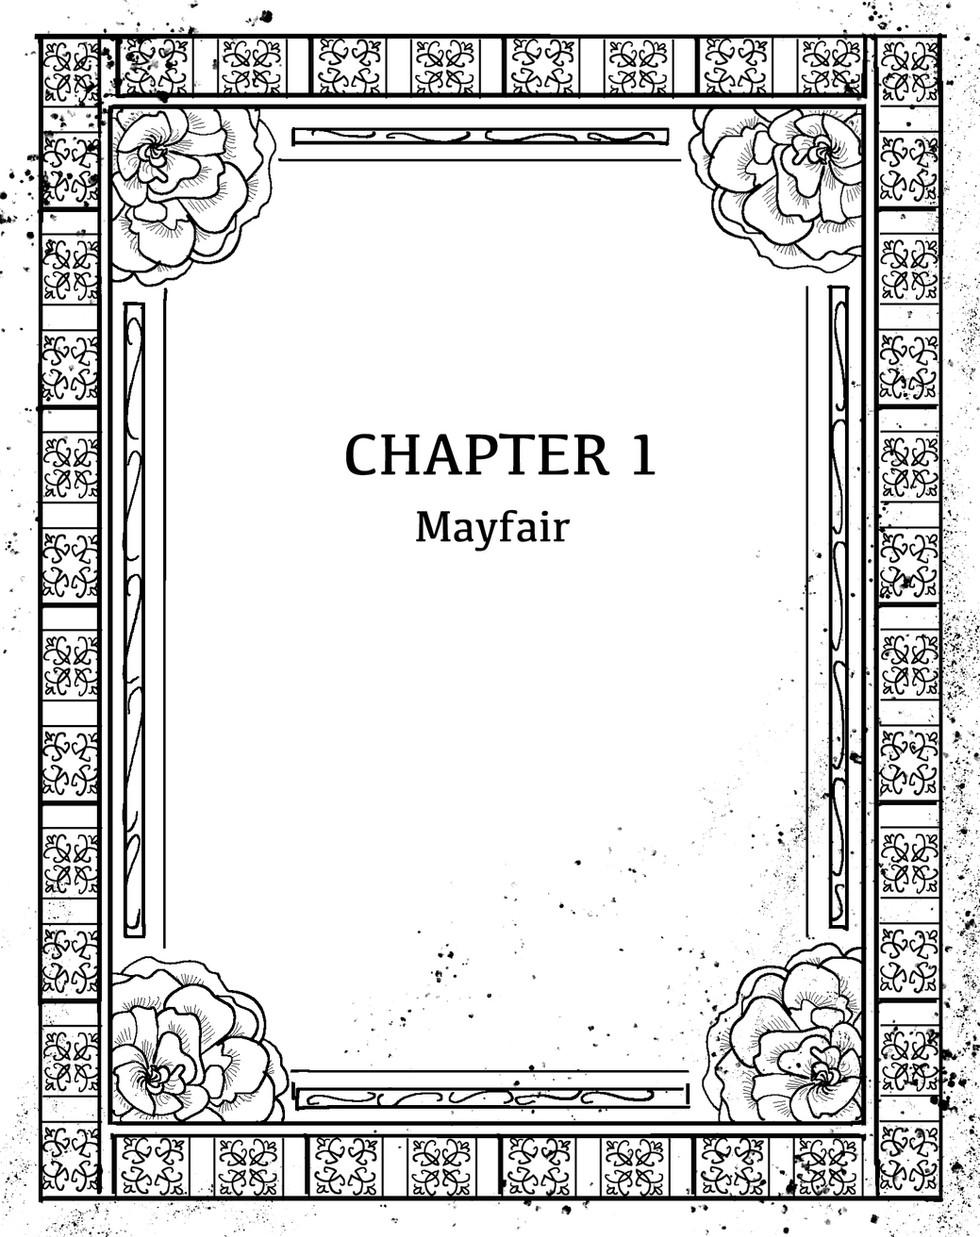 Amnesia_ChapterCard_1.jpg